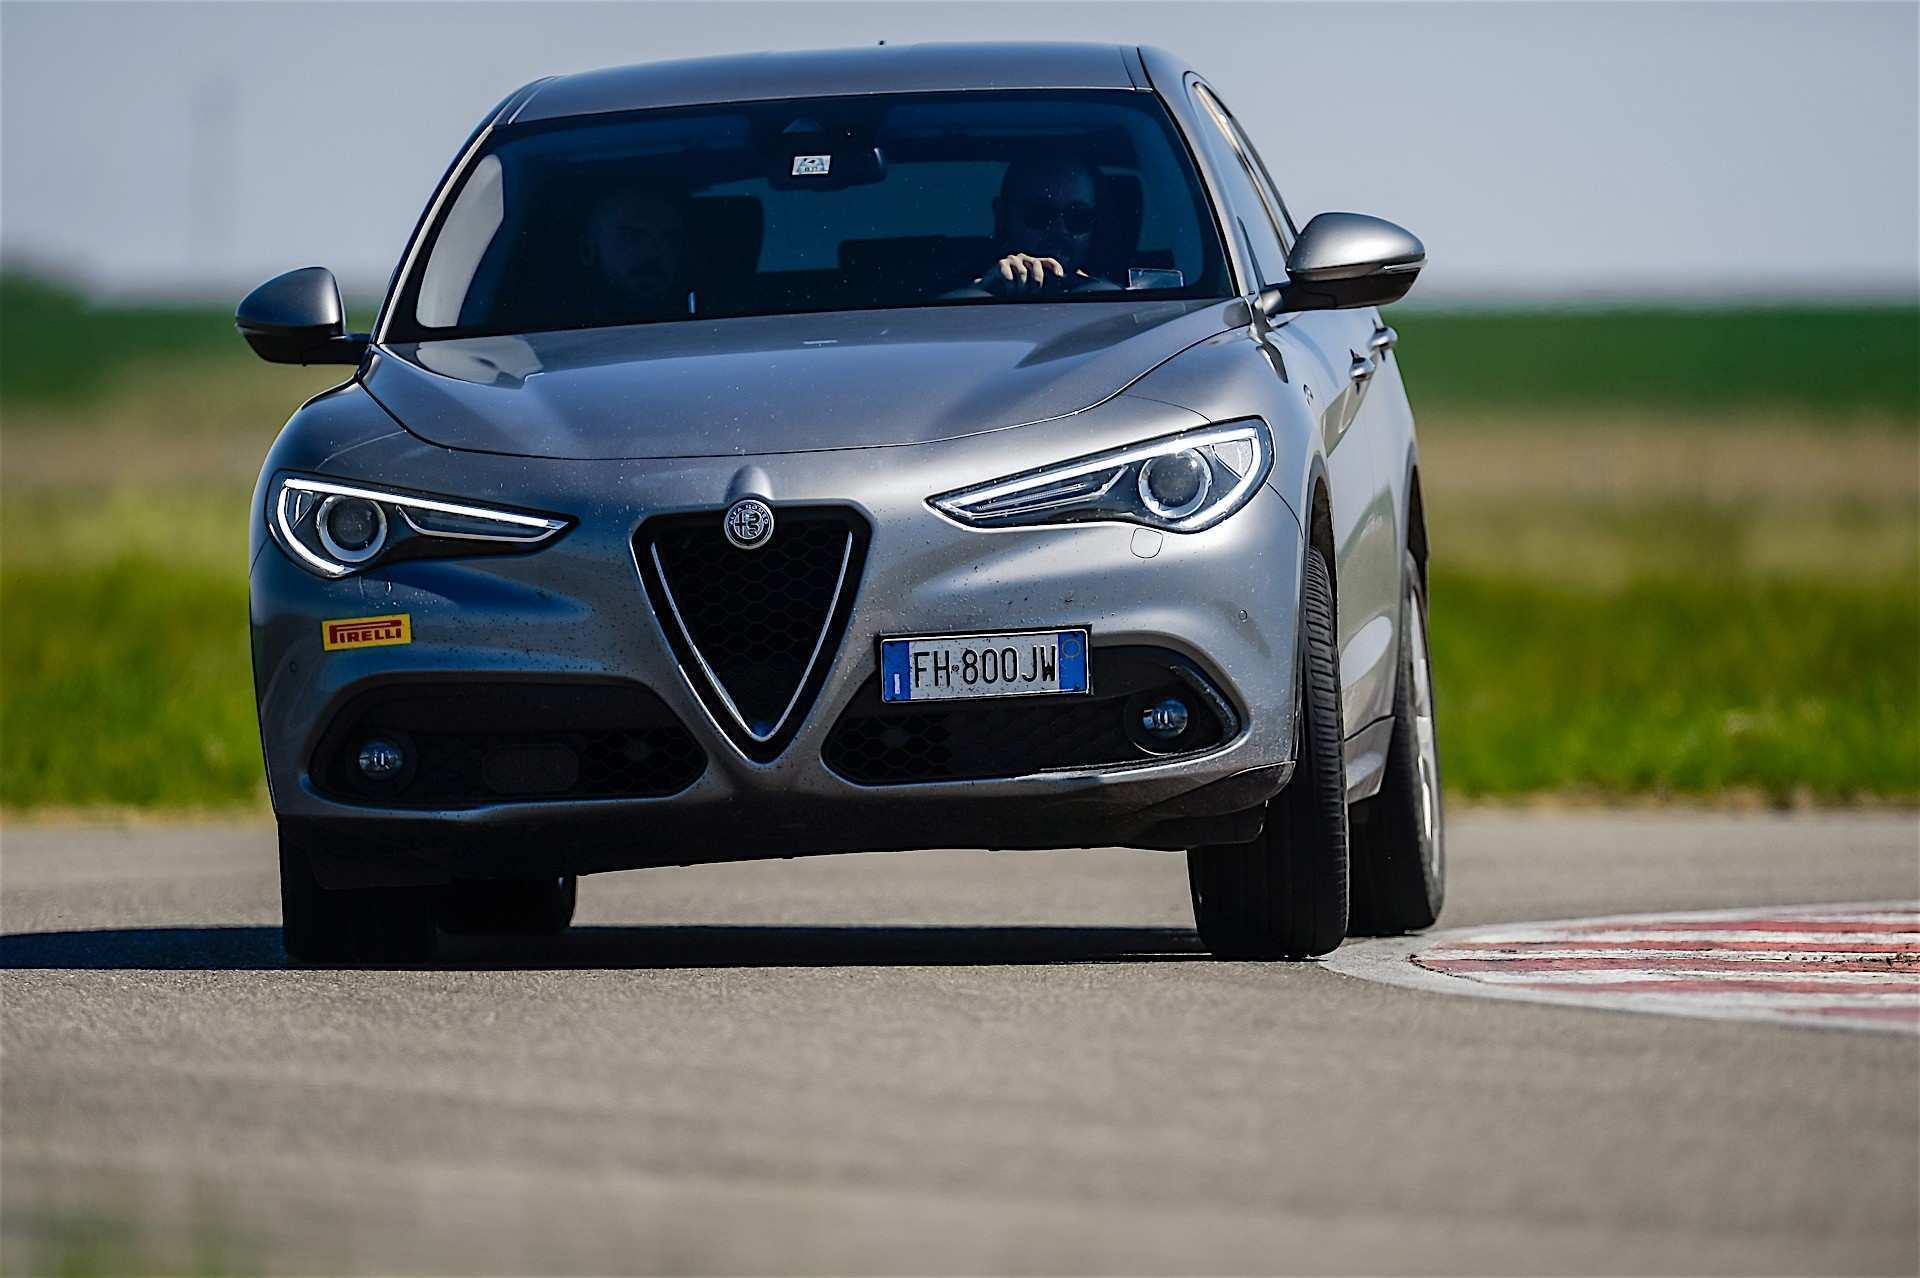 62 All New 2020 Alfa Romeo Suv First Drive by 2020 Alfa Romeo Suv